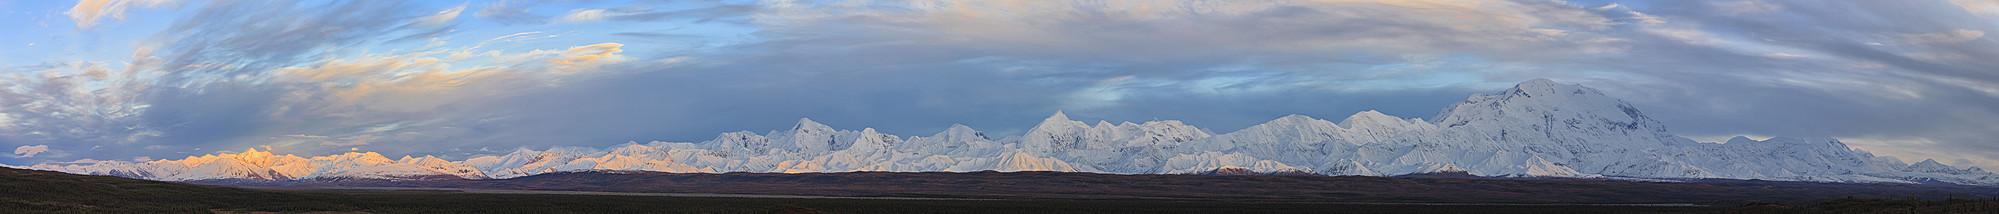 USA, Alaska, View of Mount McKinley and Alaska Range at Denali National Park - FOF004489